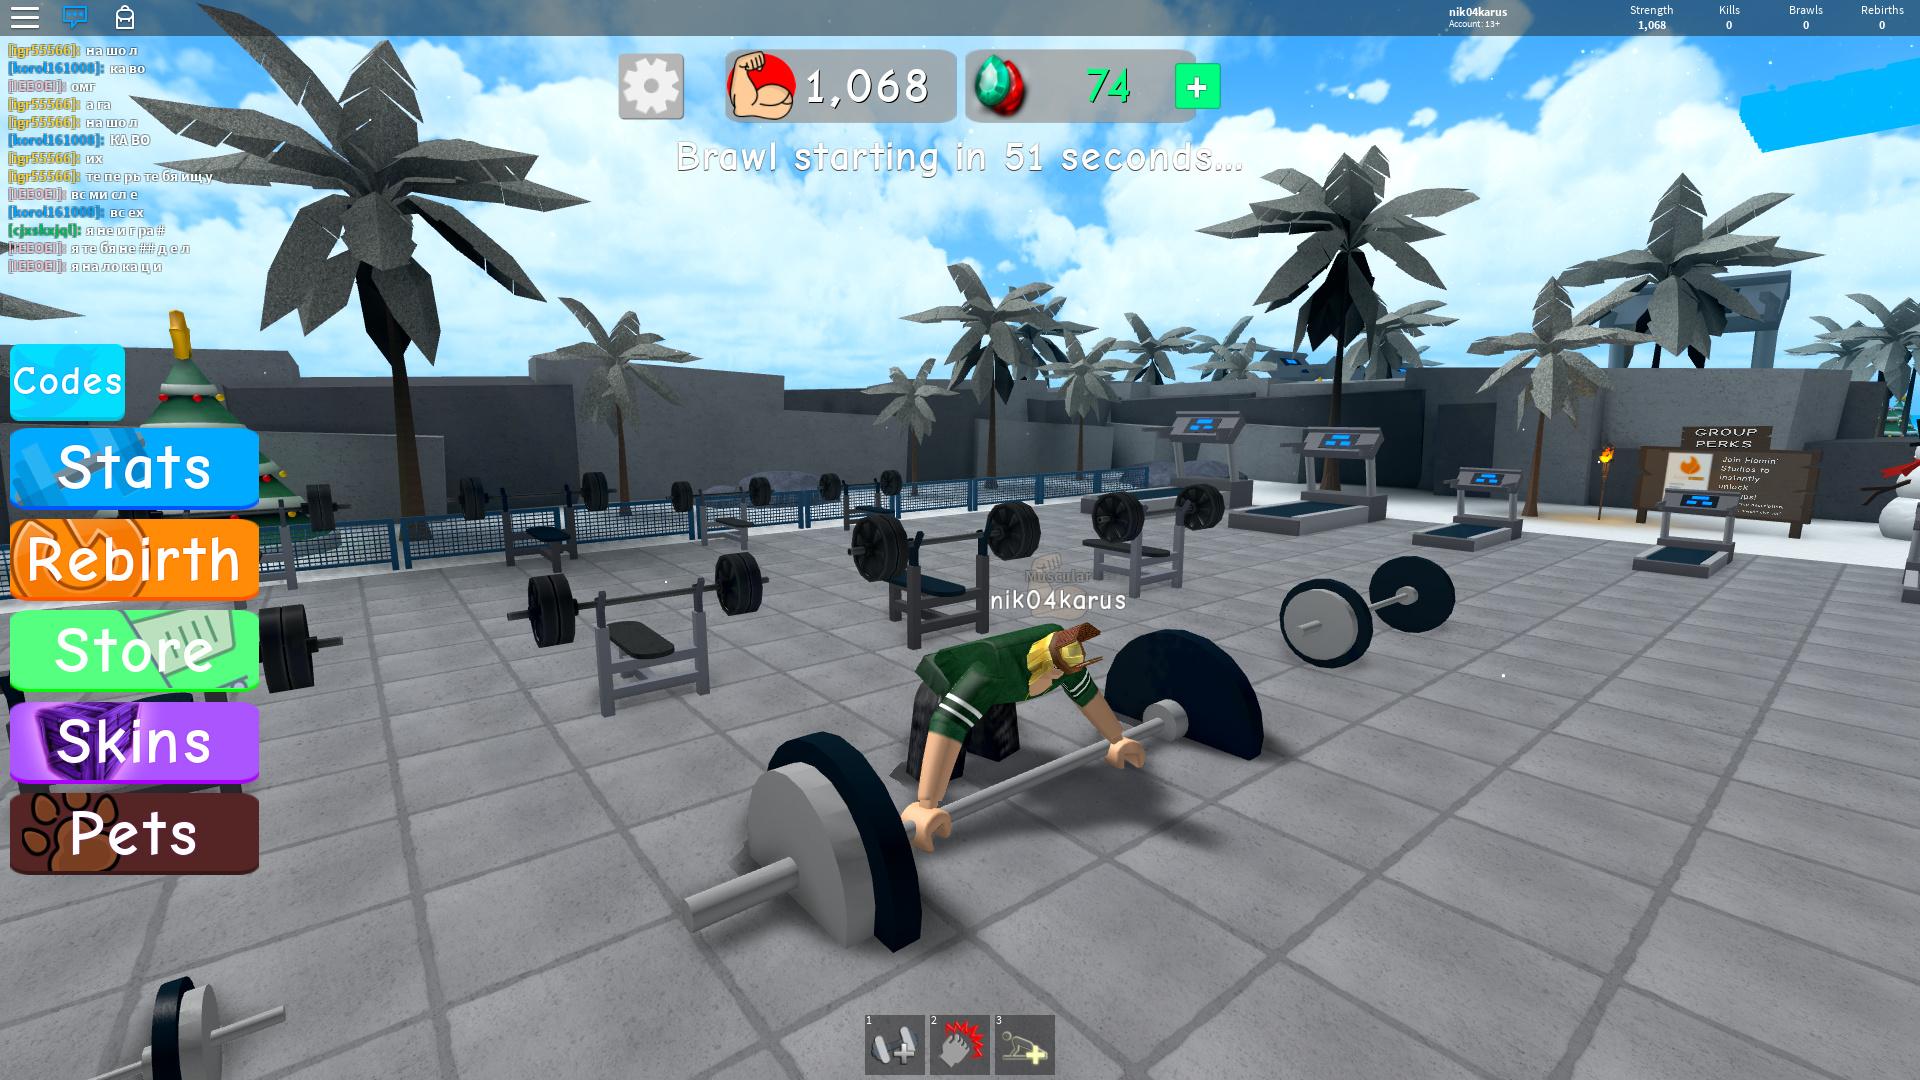 Roblox Code Weight Lifting Simulator 3 Weight Lifting Simulator 3 Codes Fan Site